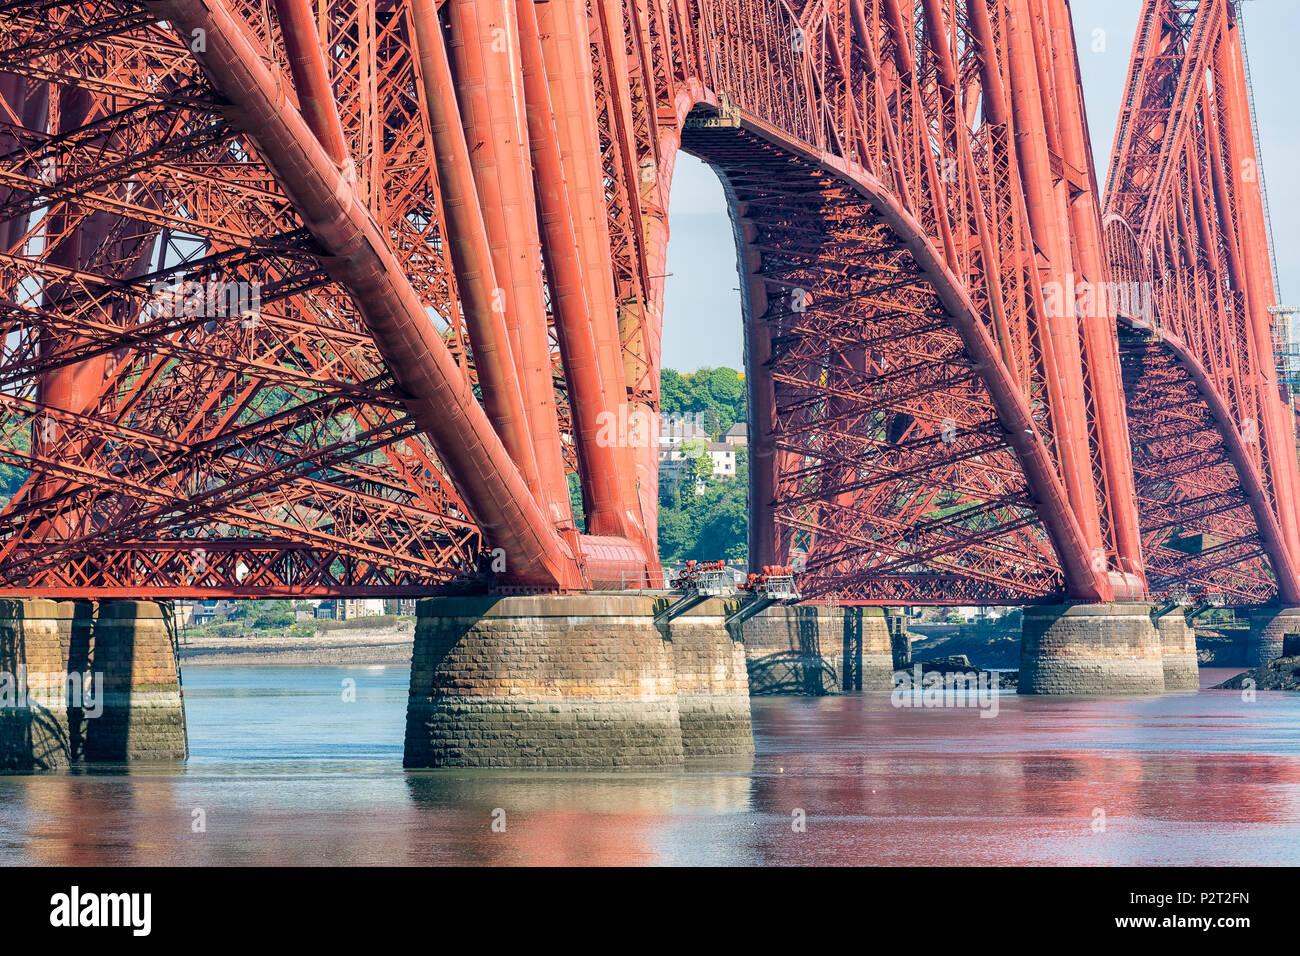 Forth Bridge, railway bridge over Firth of Forth near Queensferry in Scotland Stock Photo